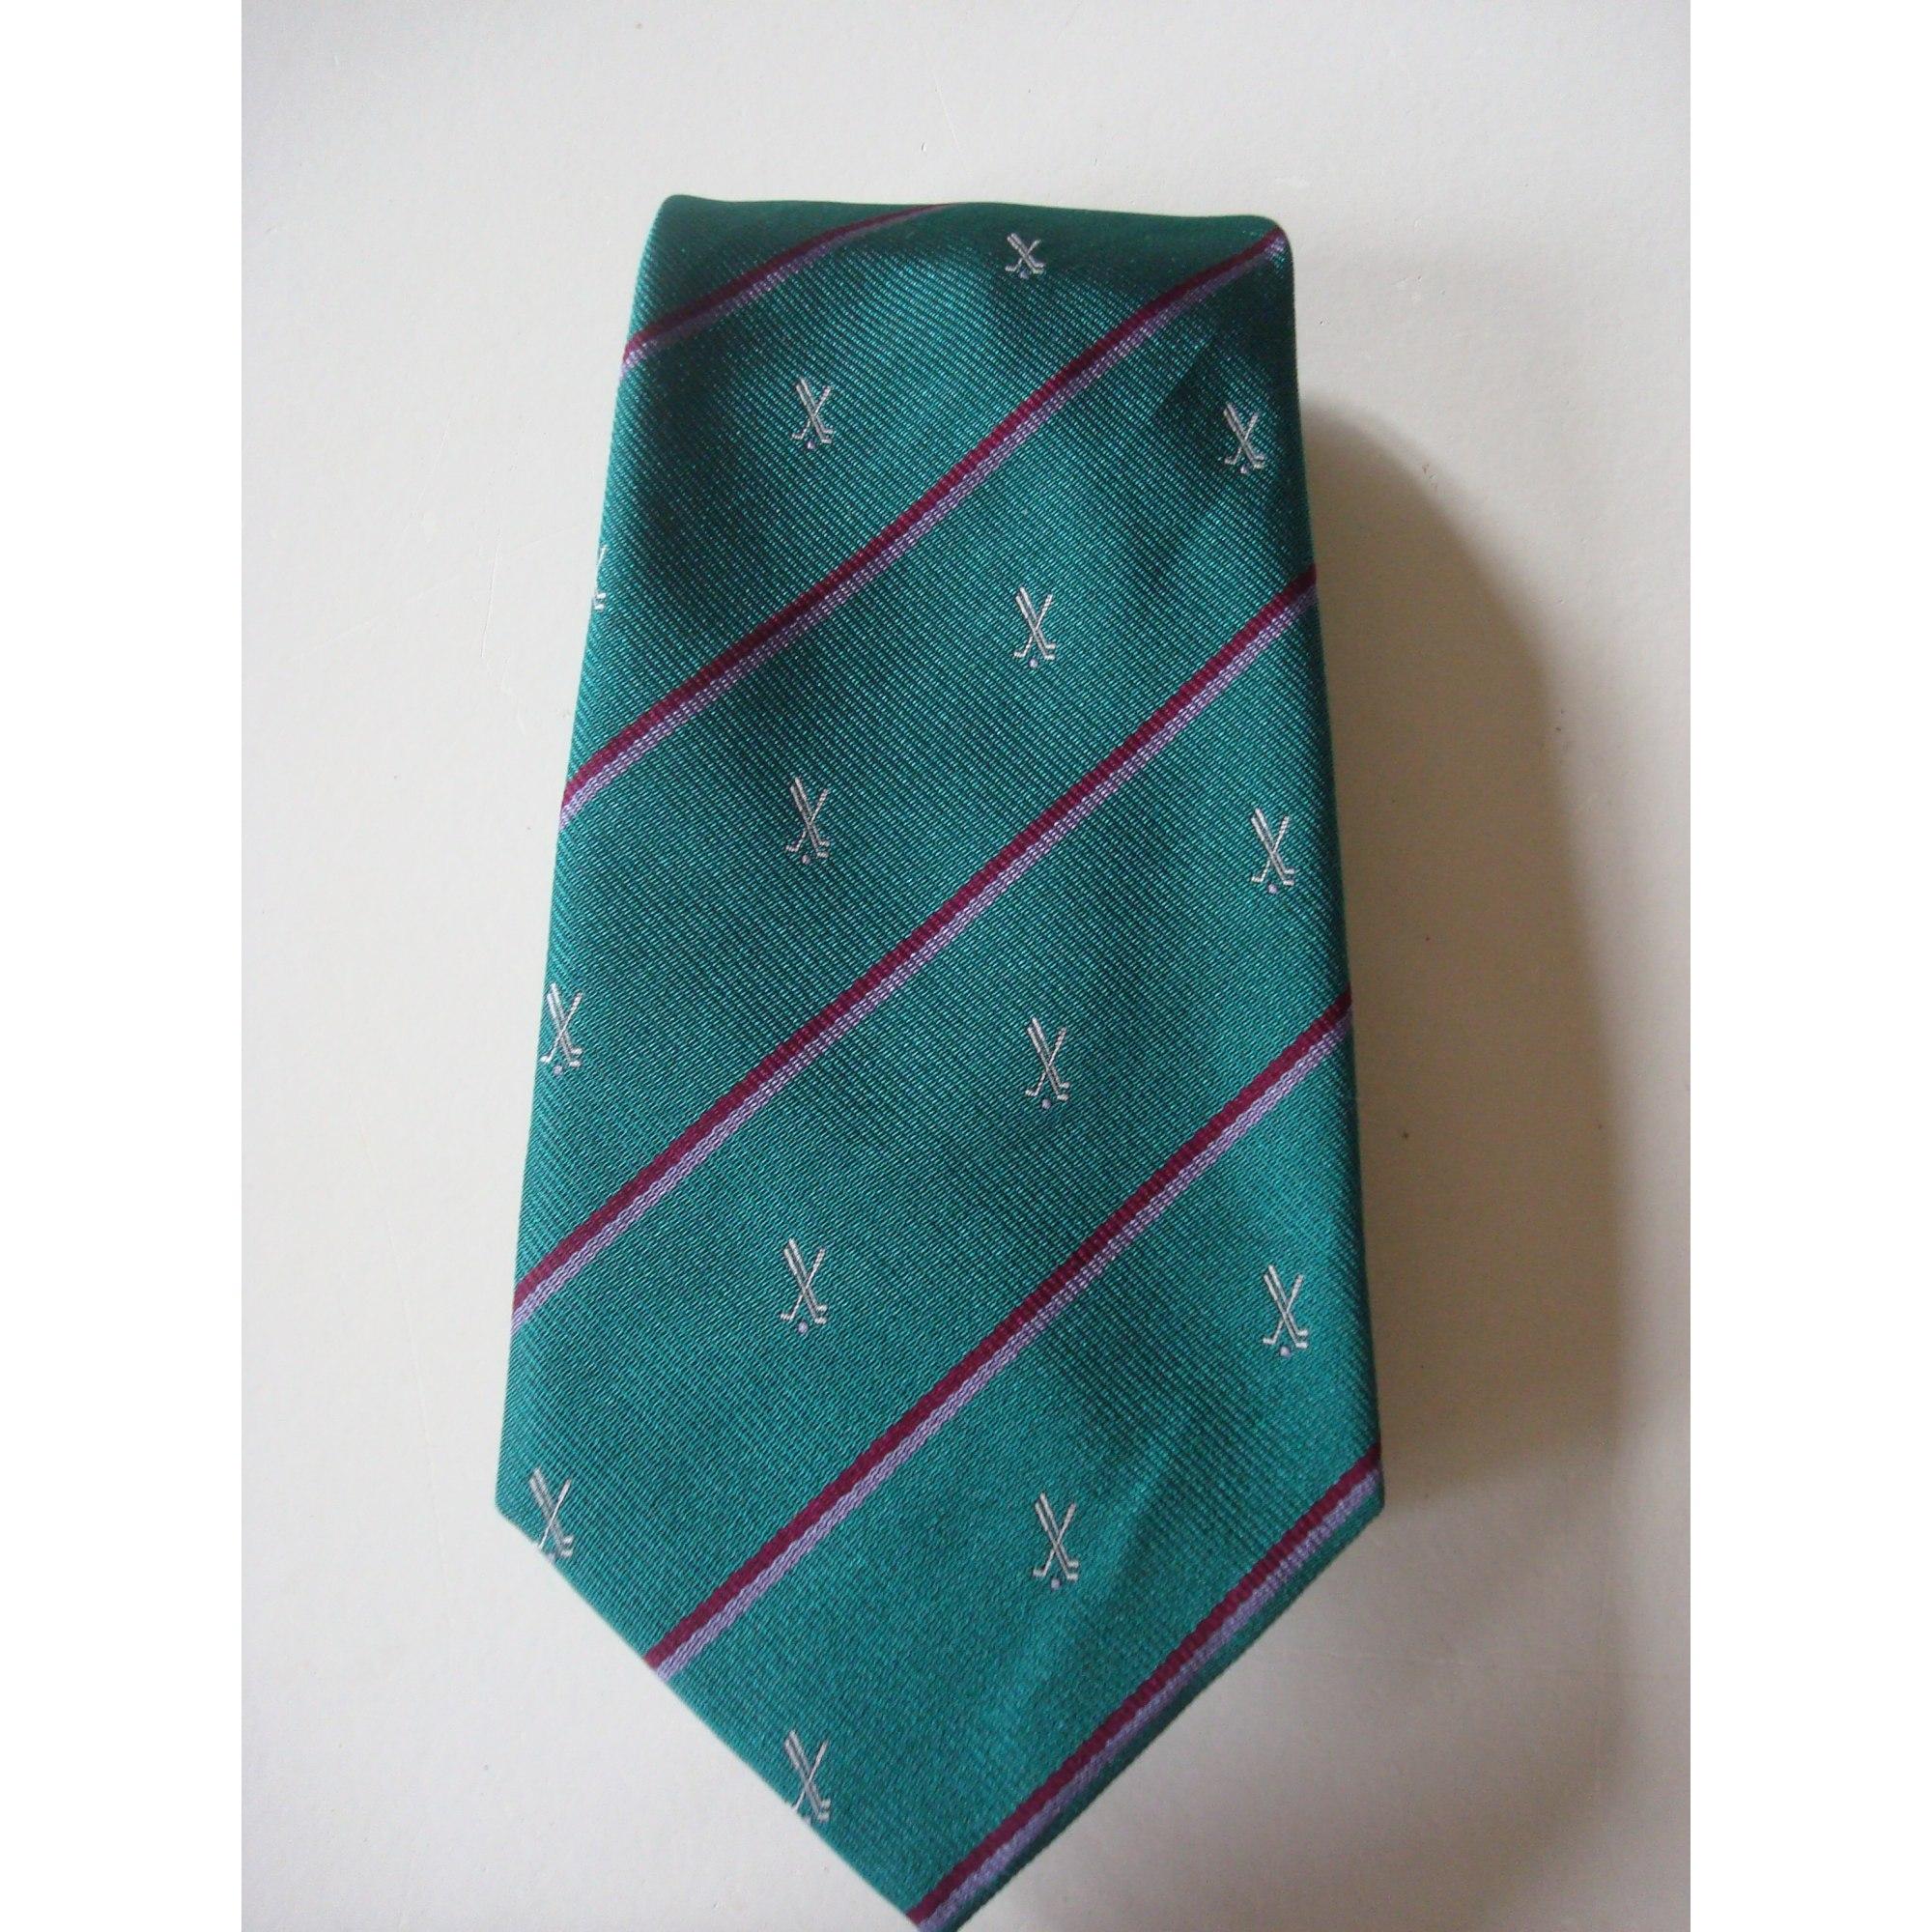 Cravate ALAIN FIGARET Vert